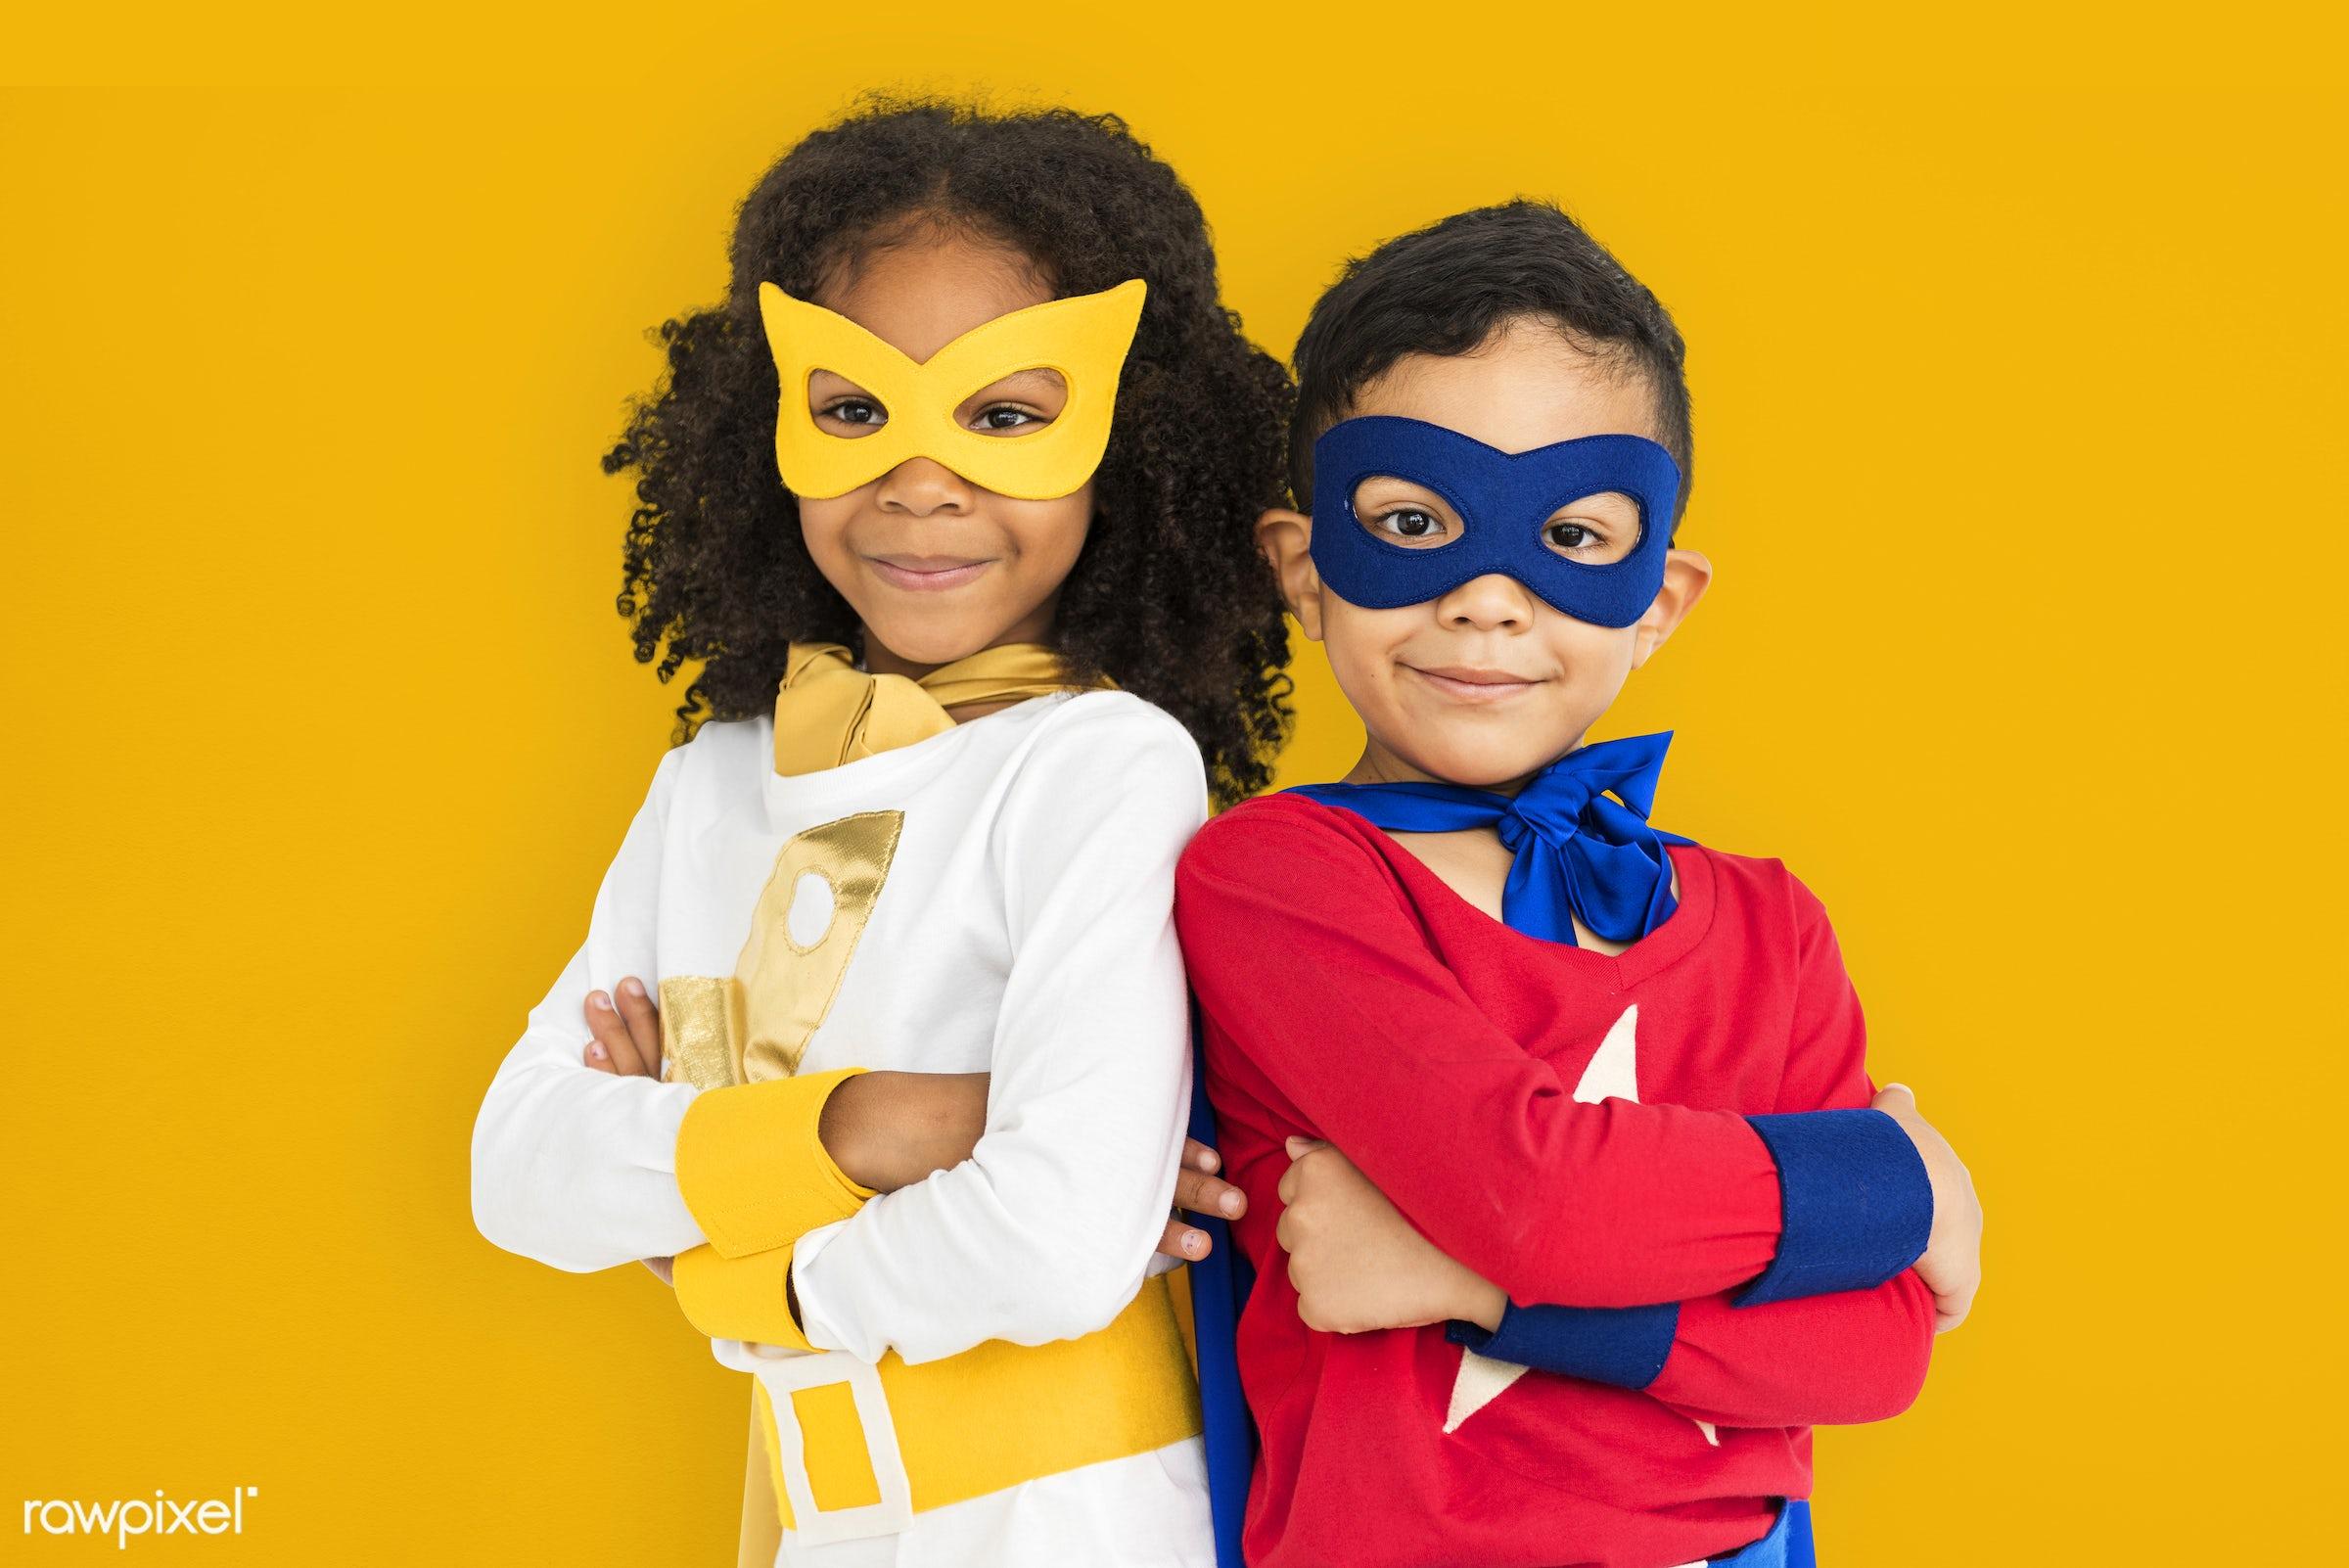 children, courageous, kid, adolescence, child, girl, inspiration, leader, beige, idol, childhood, superhero, isolated, hero...